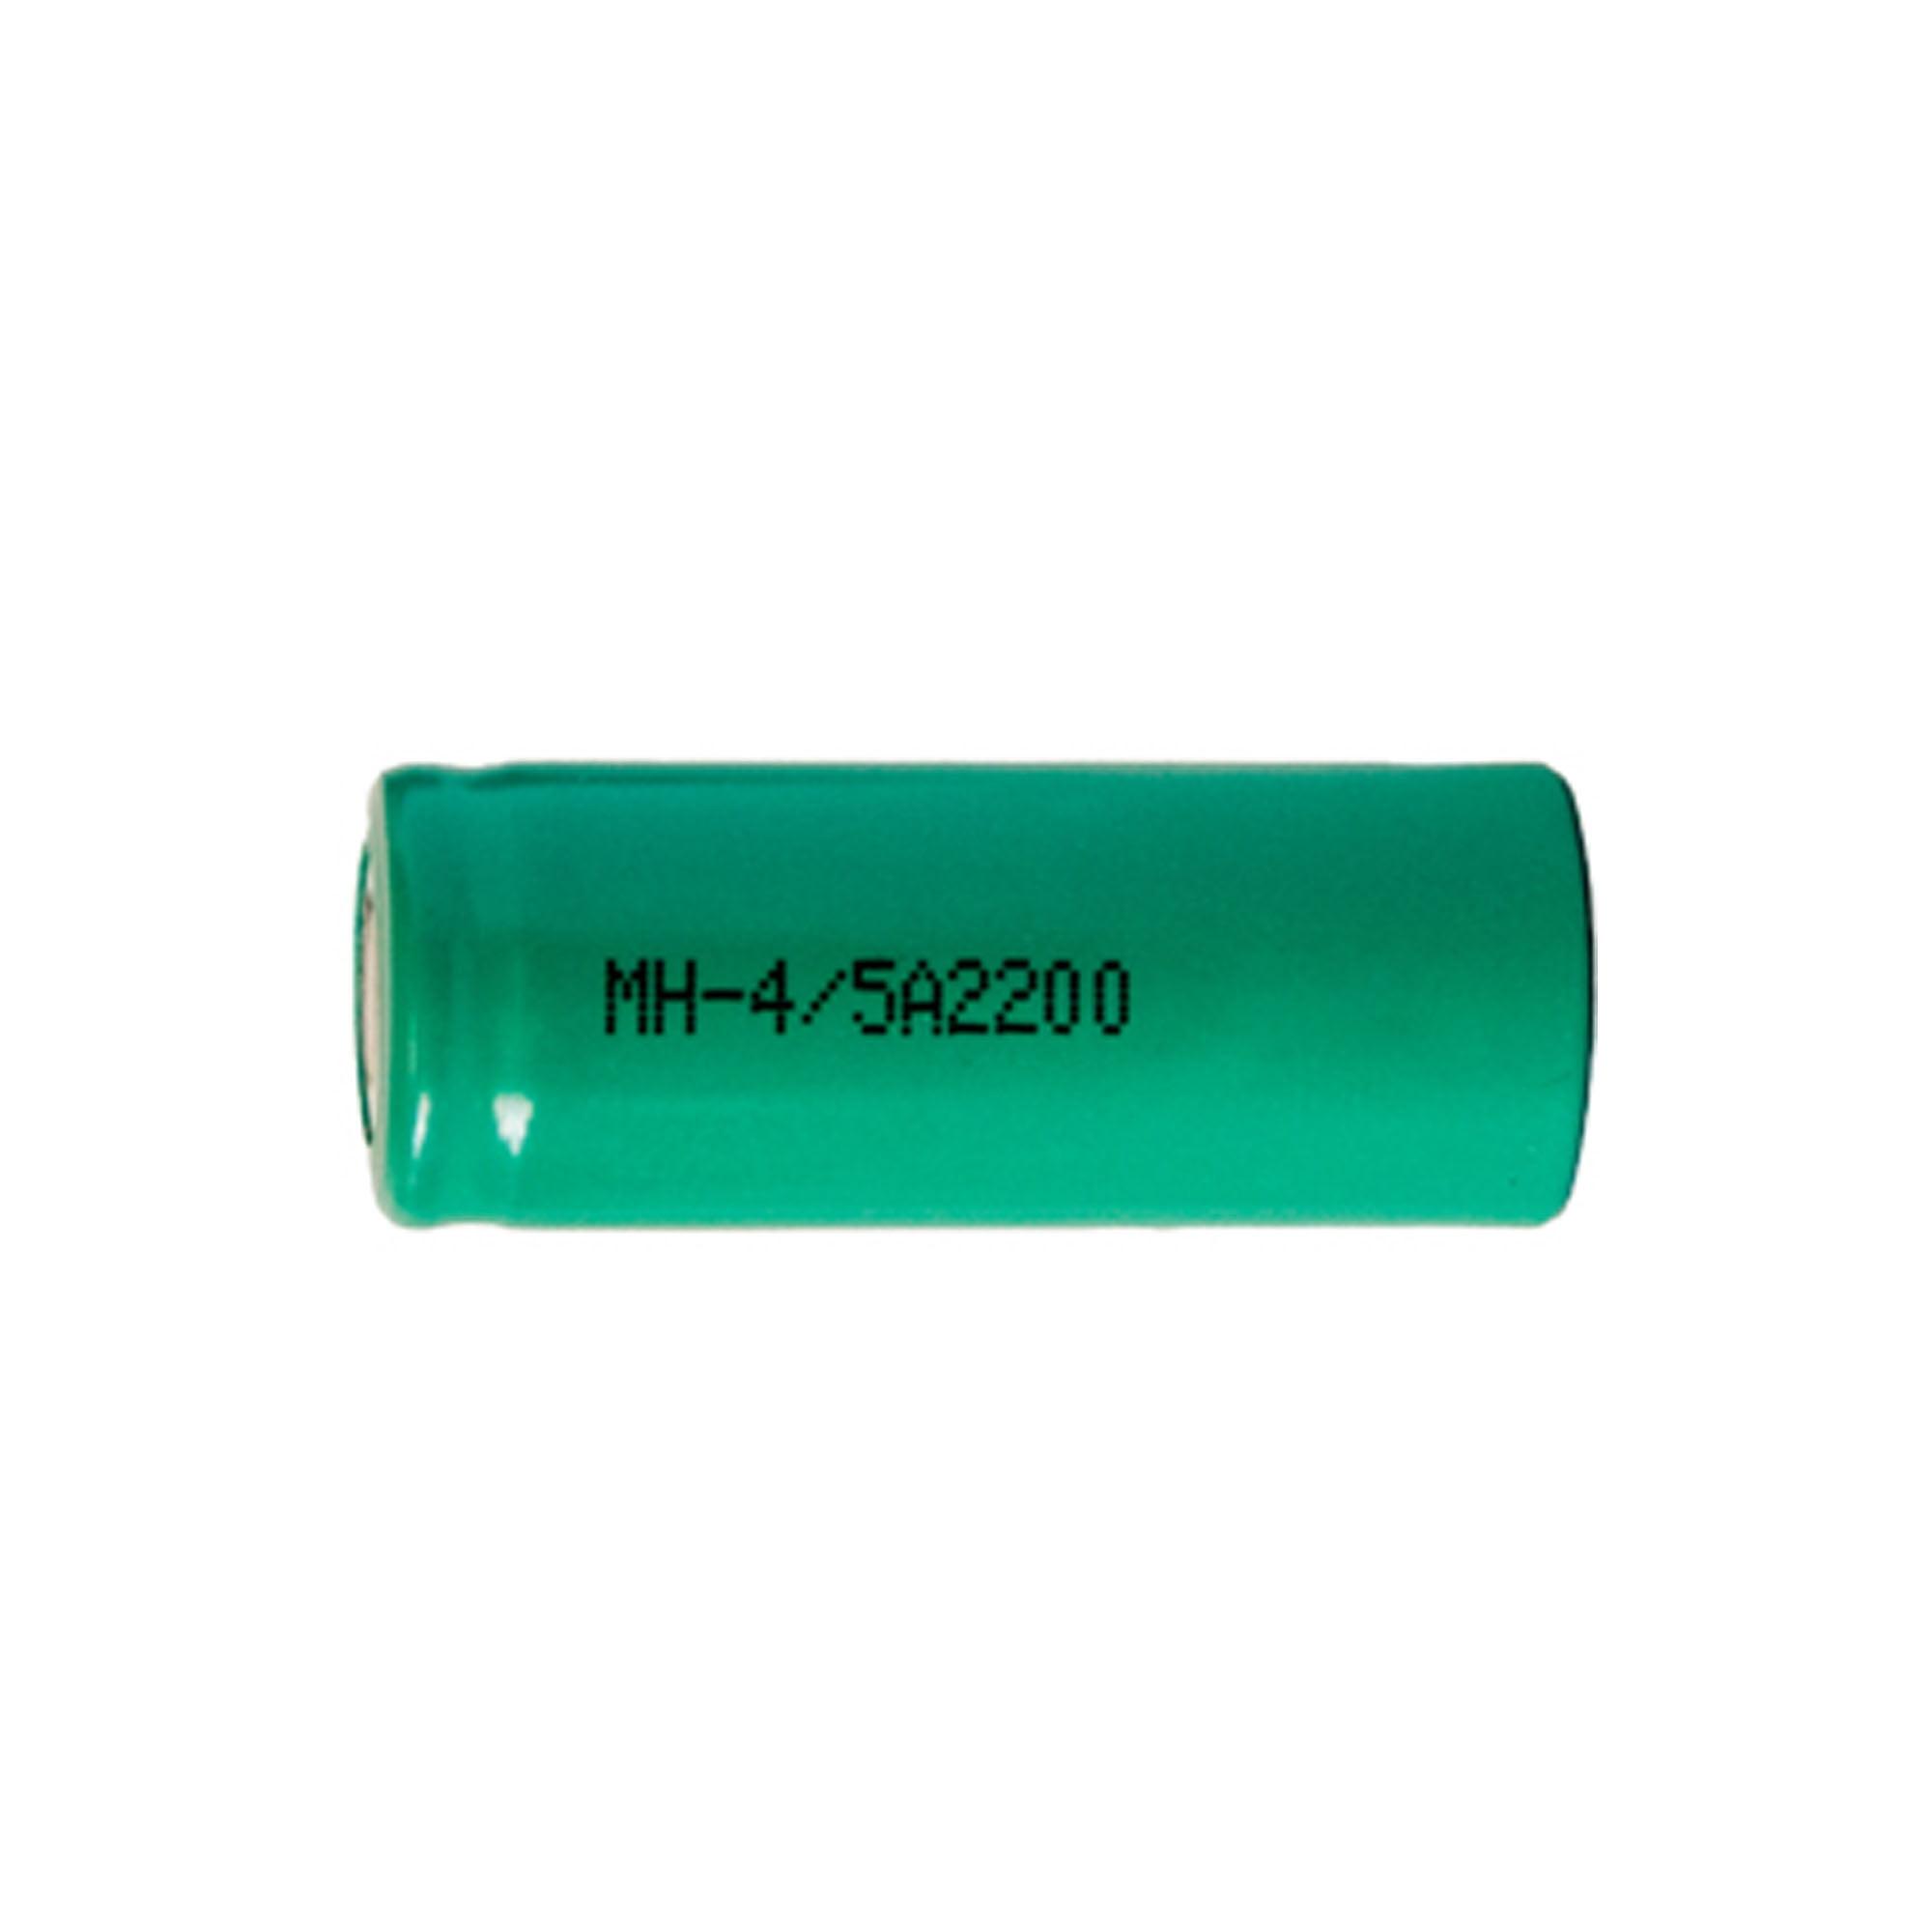 50-Pack 4/5 A NiMH Flat Top Batteries (2200 mAh) - image 1 de 1